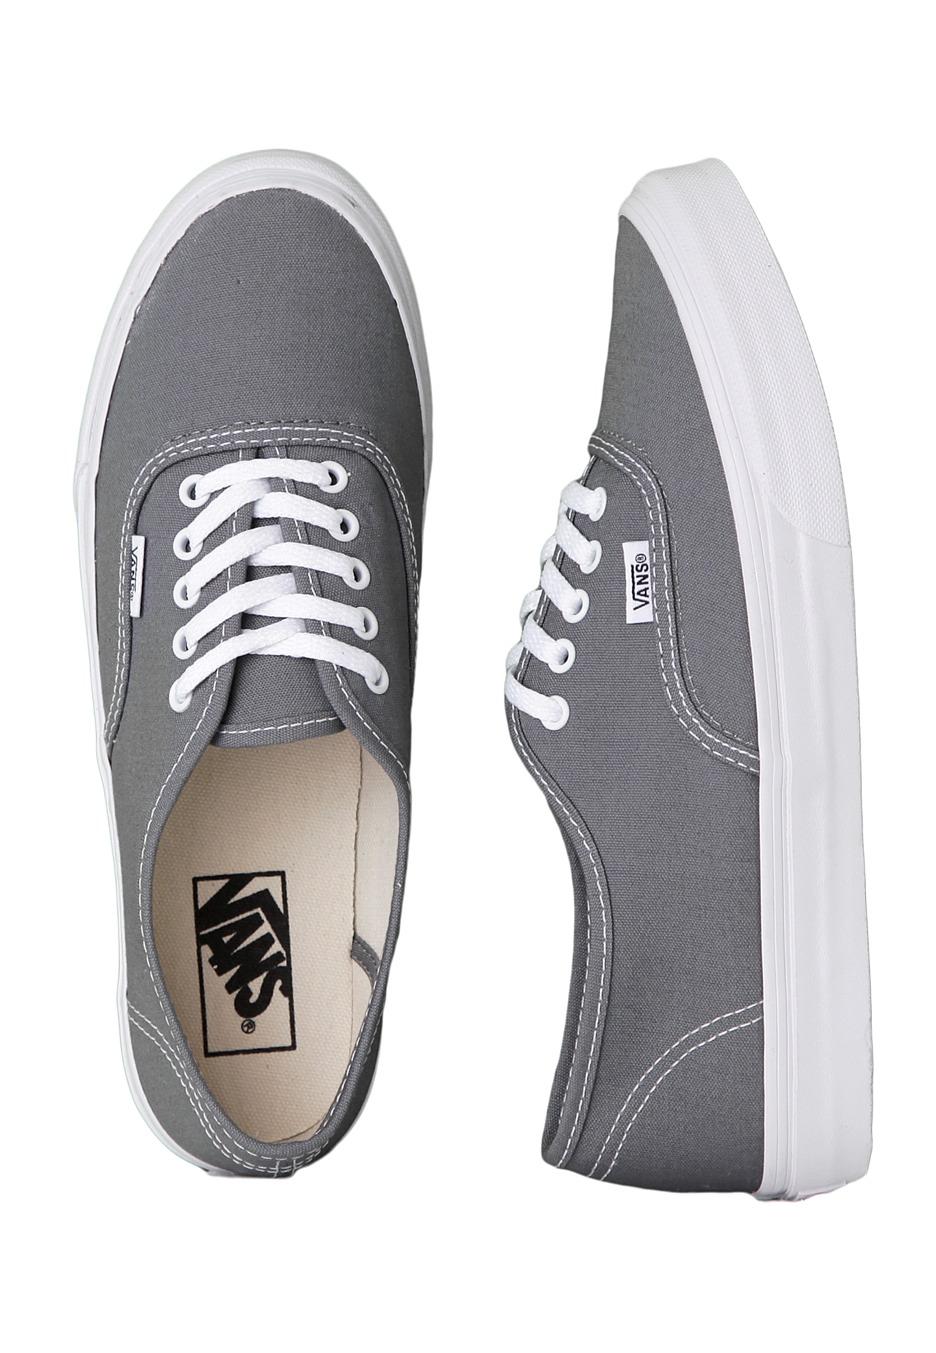 46767892164566 Pictures of Vans Shoes For Girls Gray - kidskunst.info